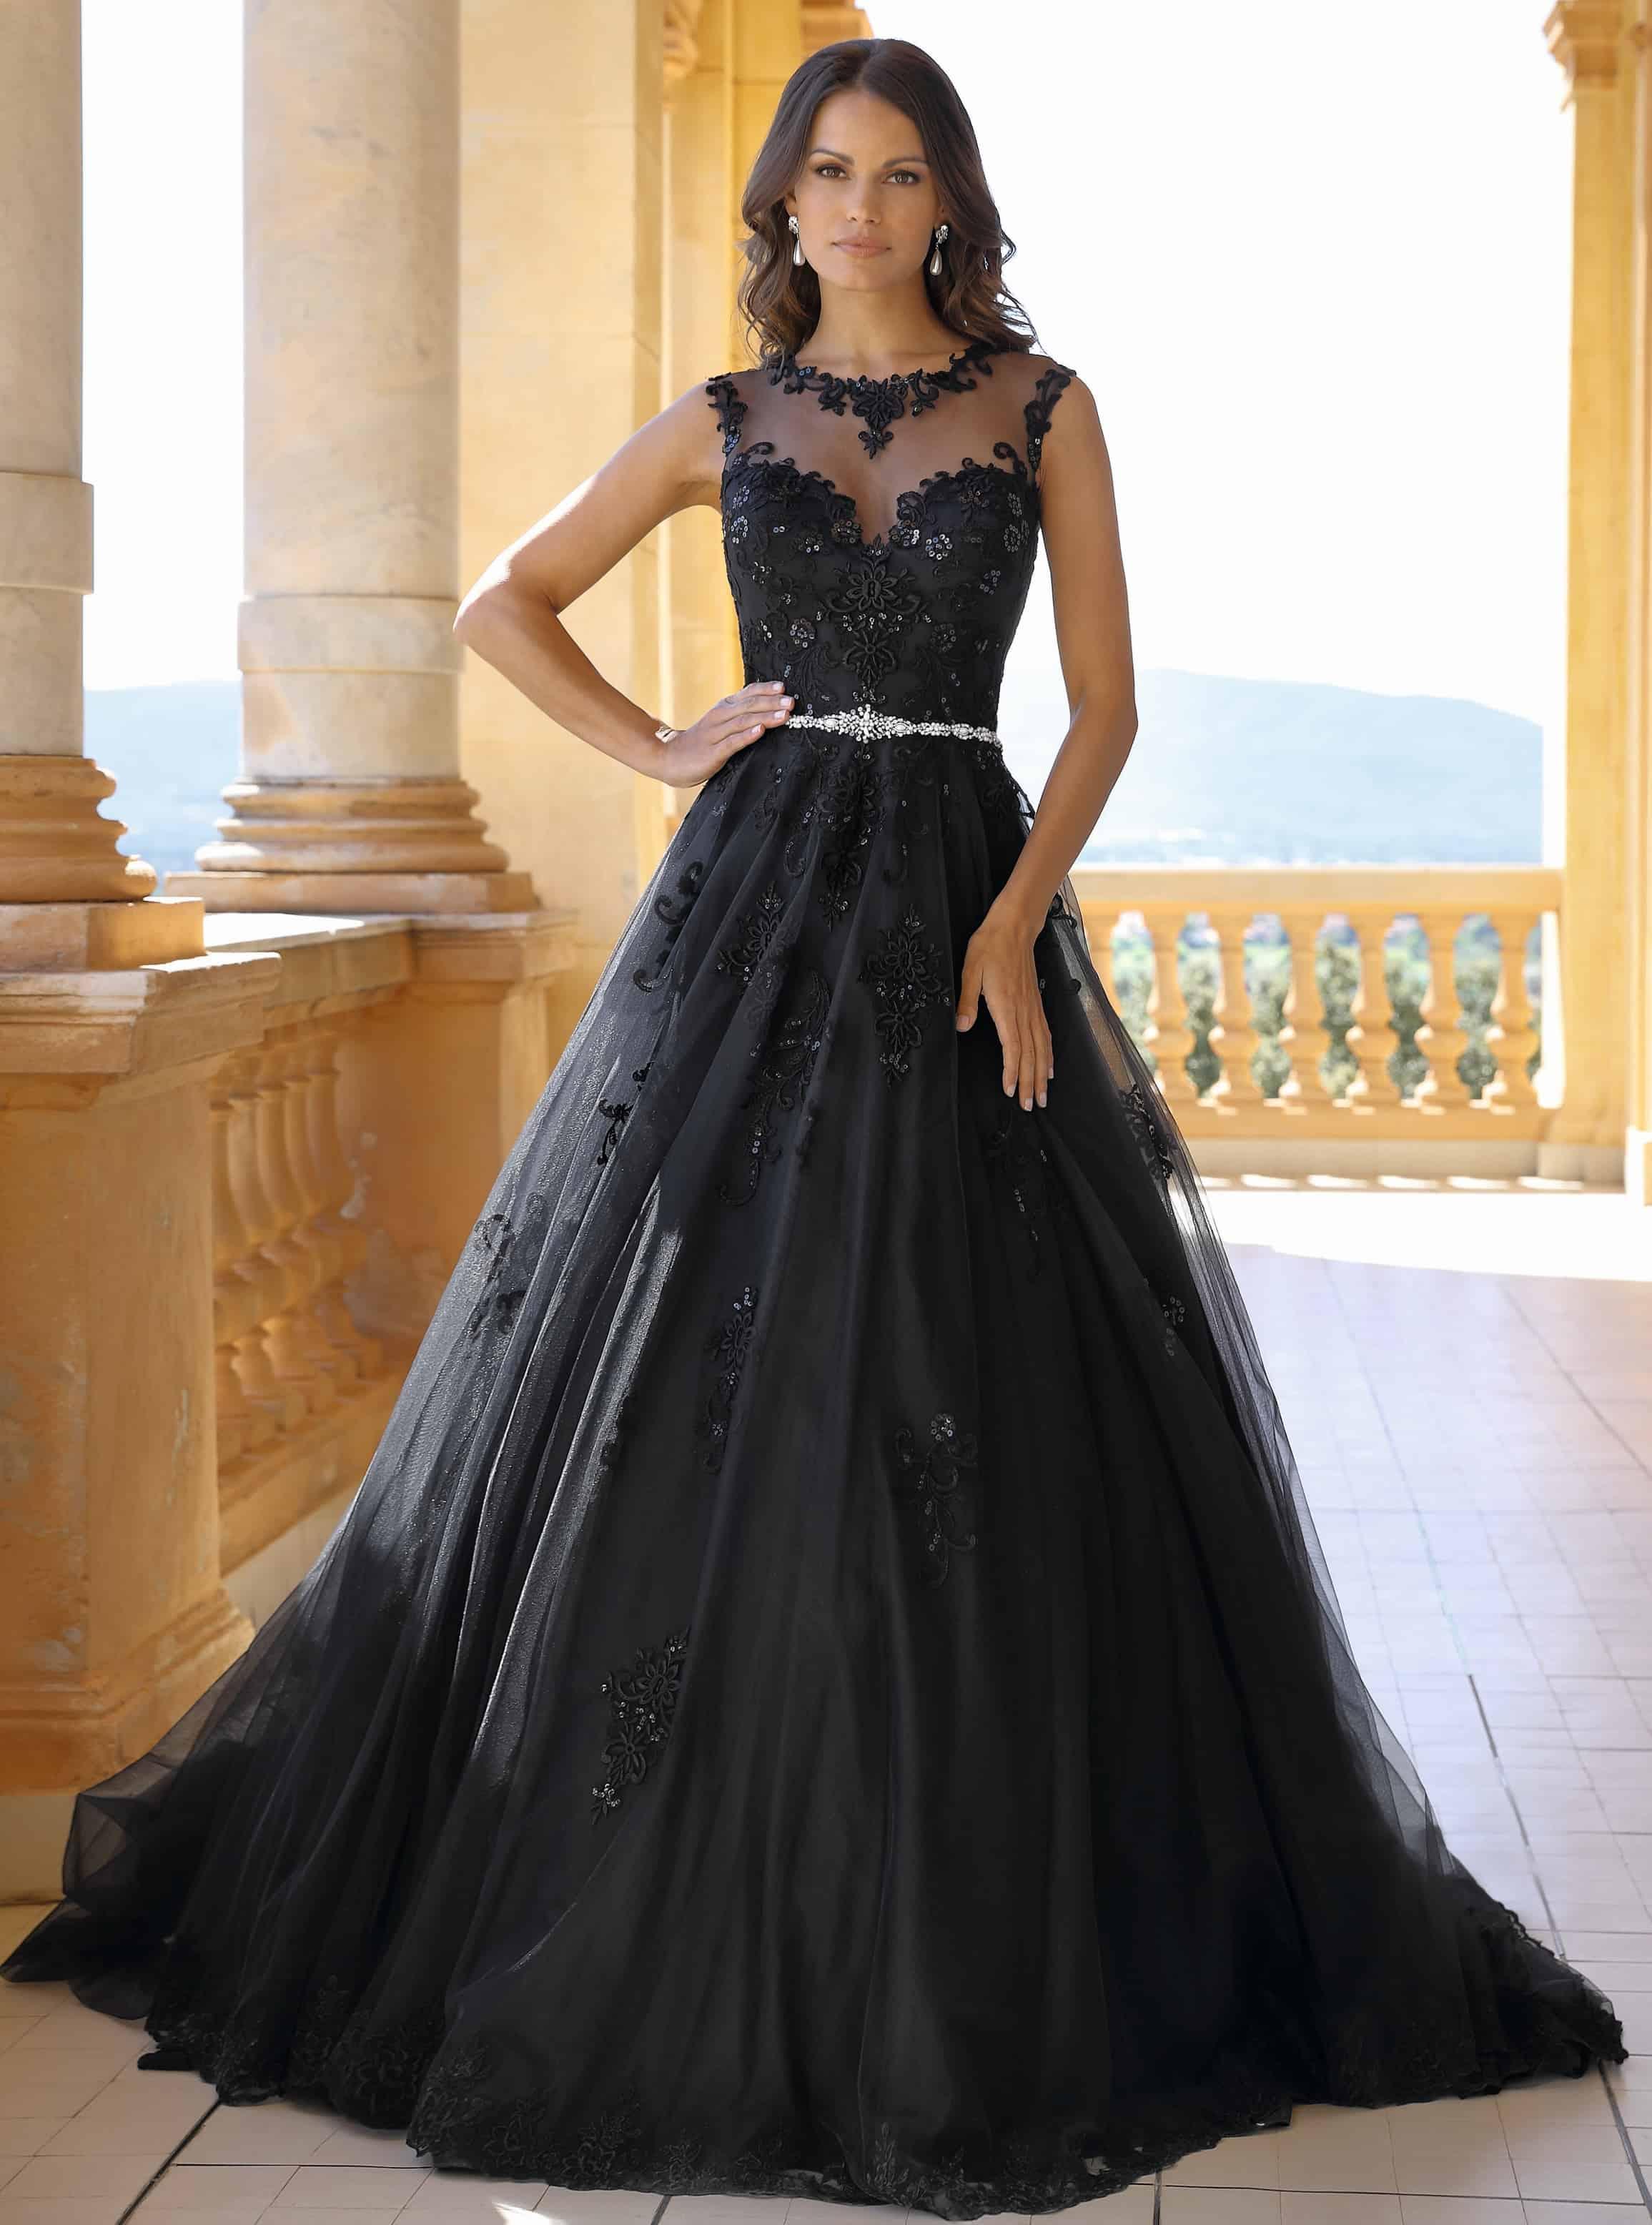 Trouwjurk zwarte bruidsjapon prinsessenjurk